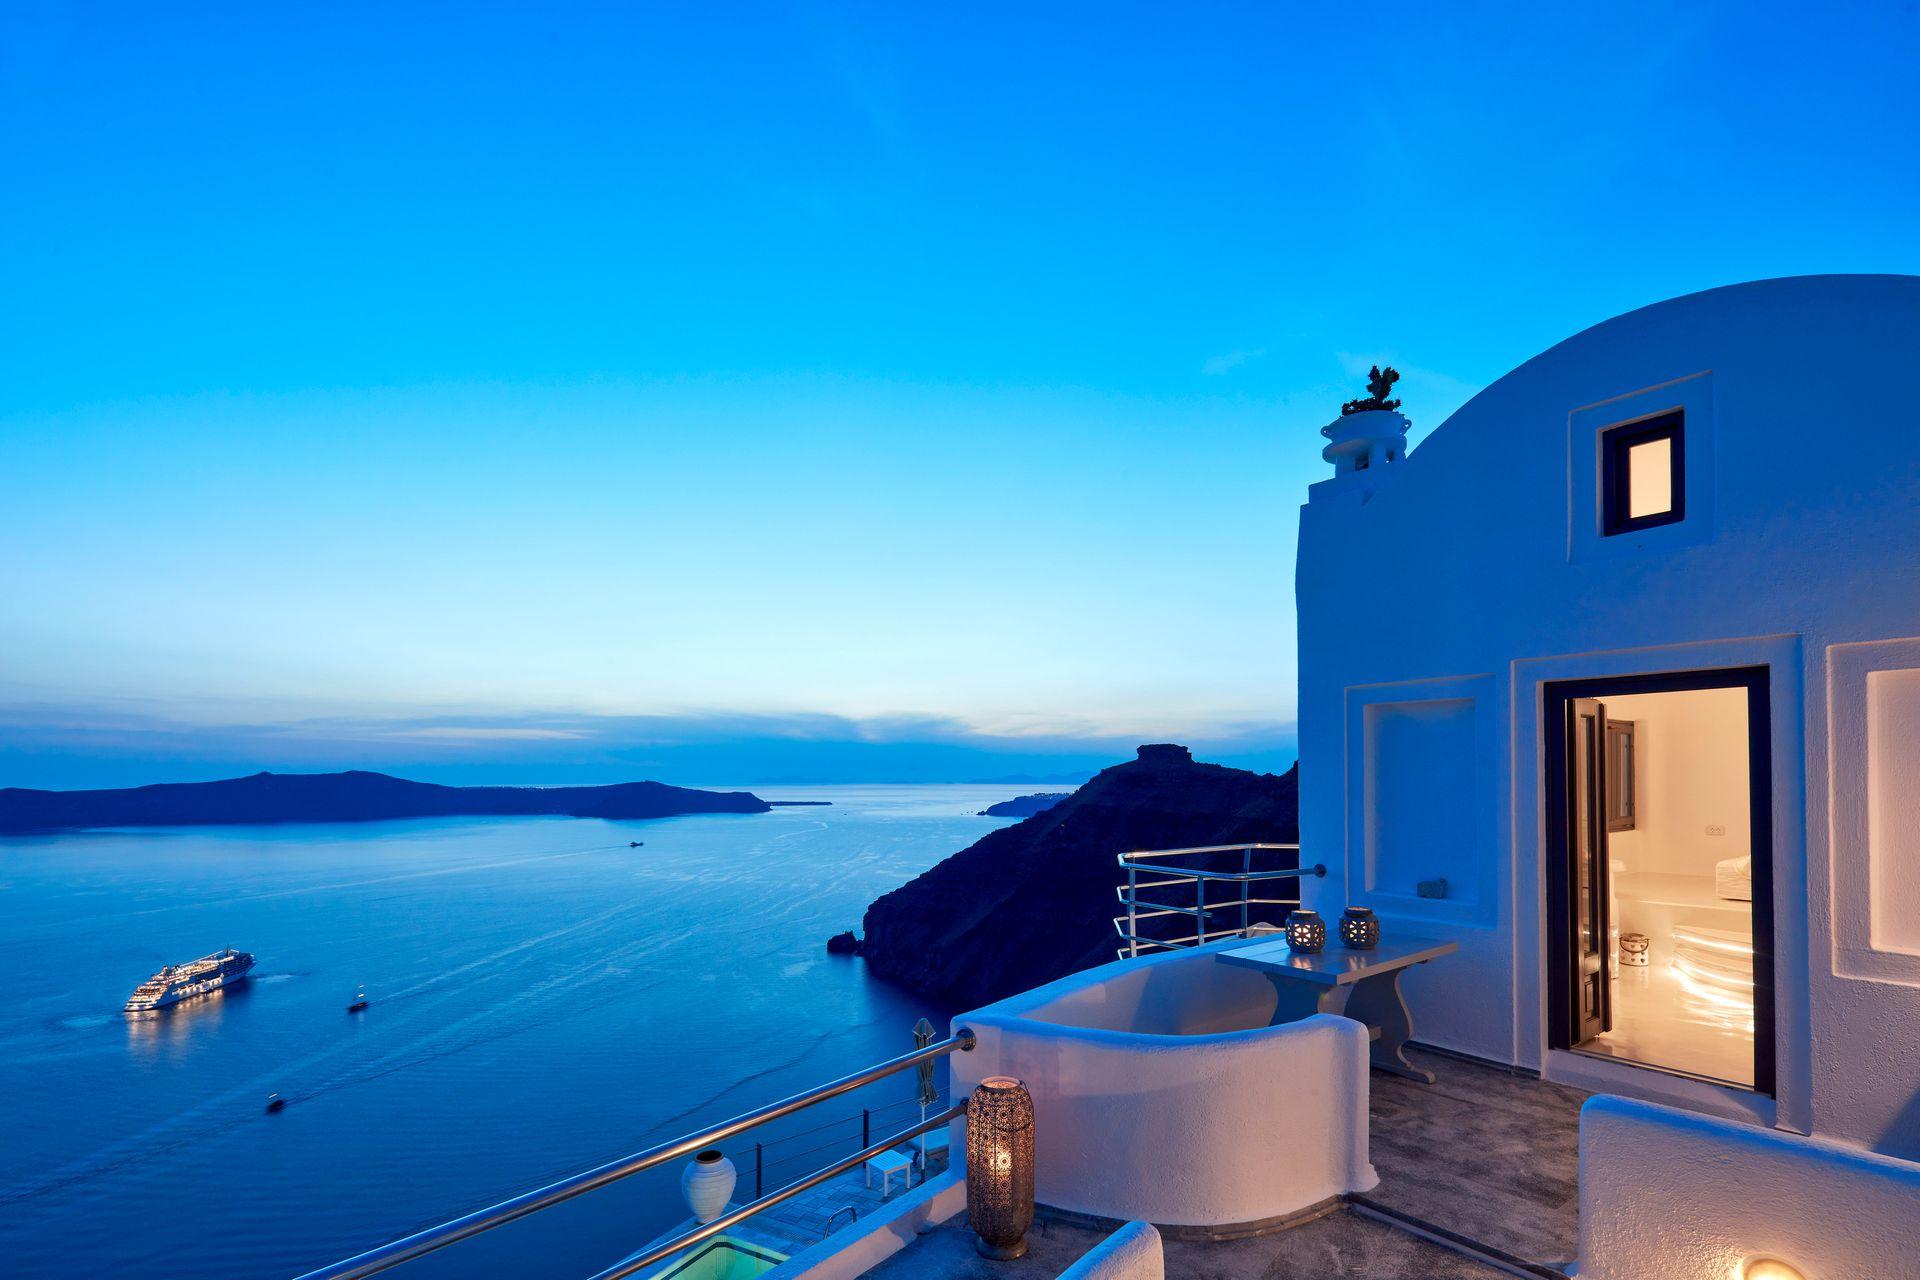 Homeric Poems Santorini - Σαντορίνη ✦ 2 Ημέρες (1 Διανυκτέρευση)